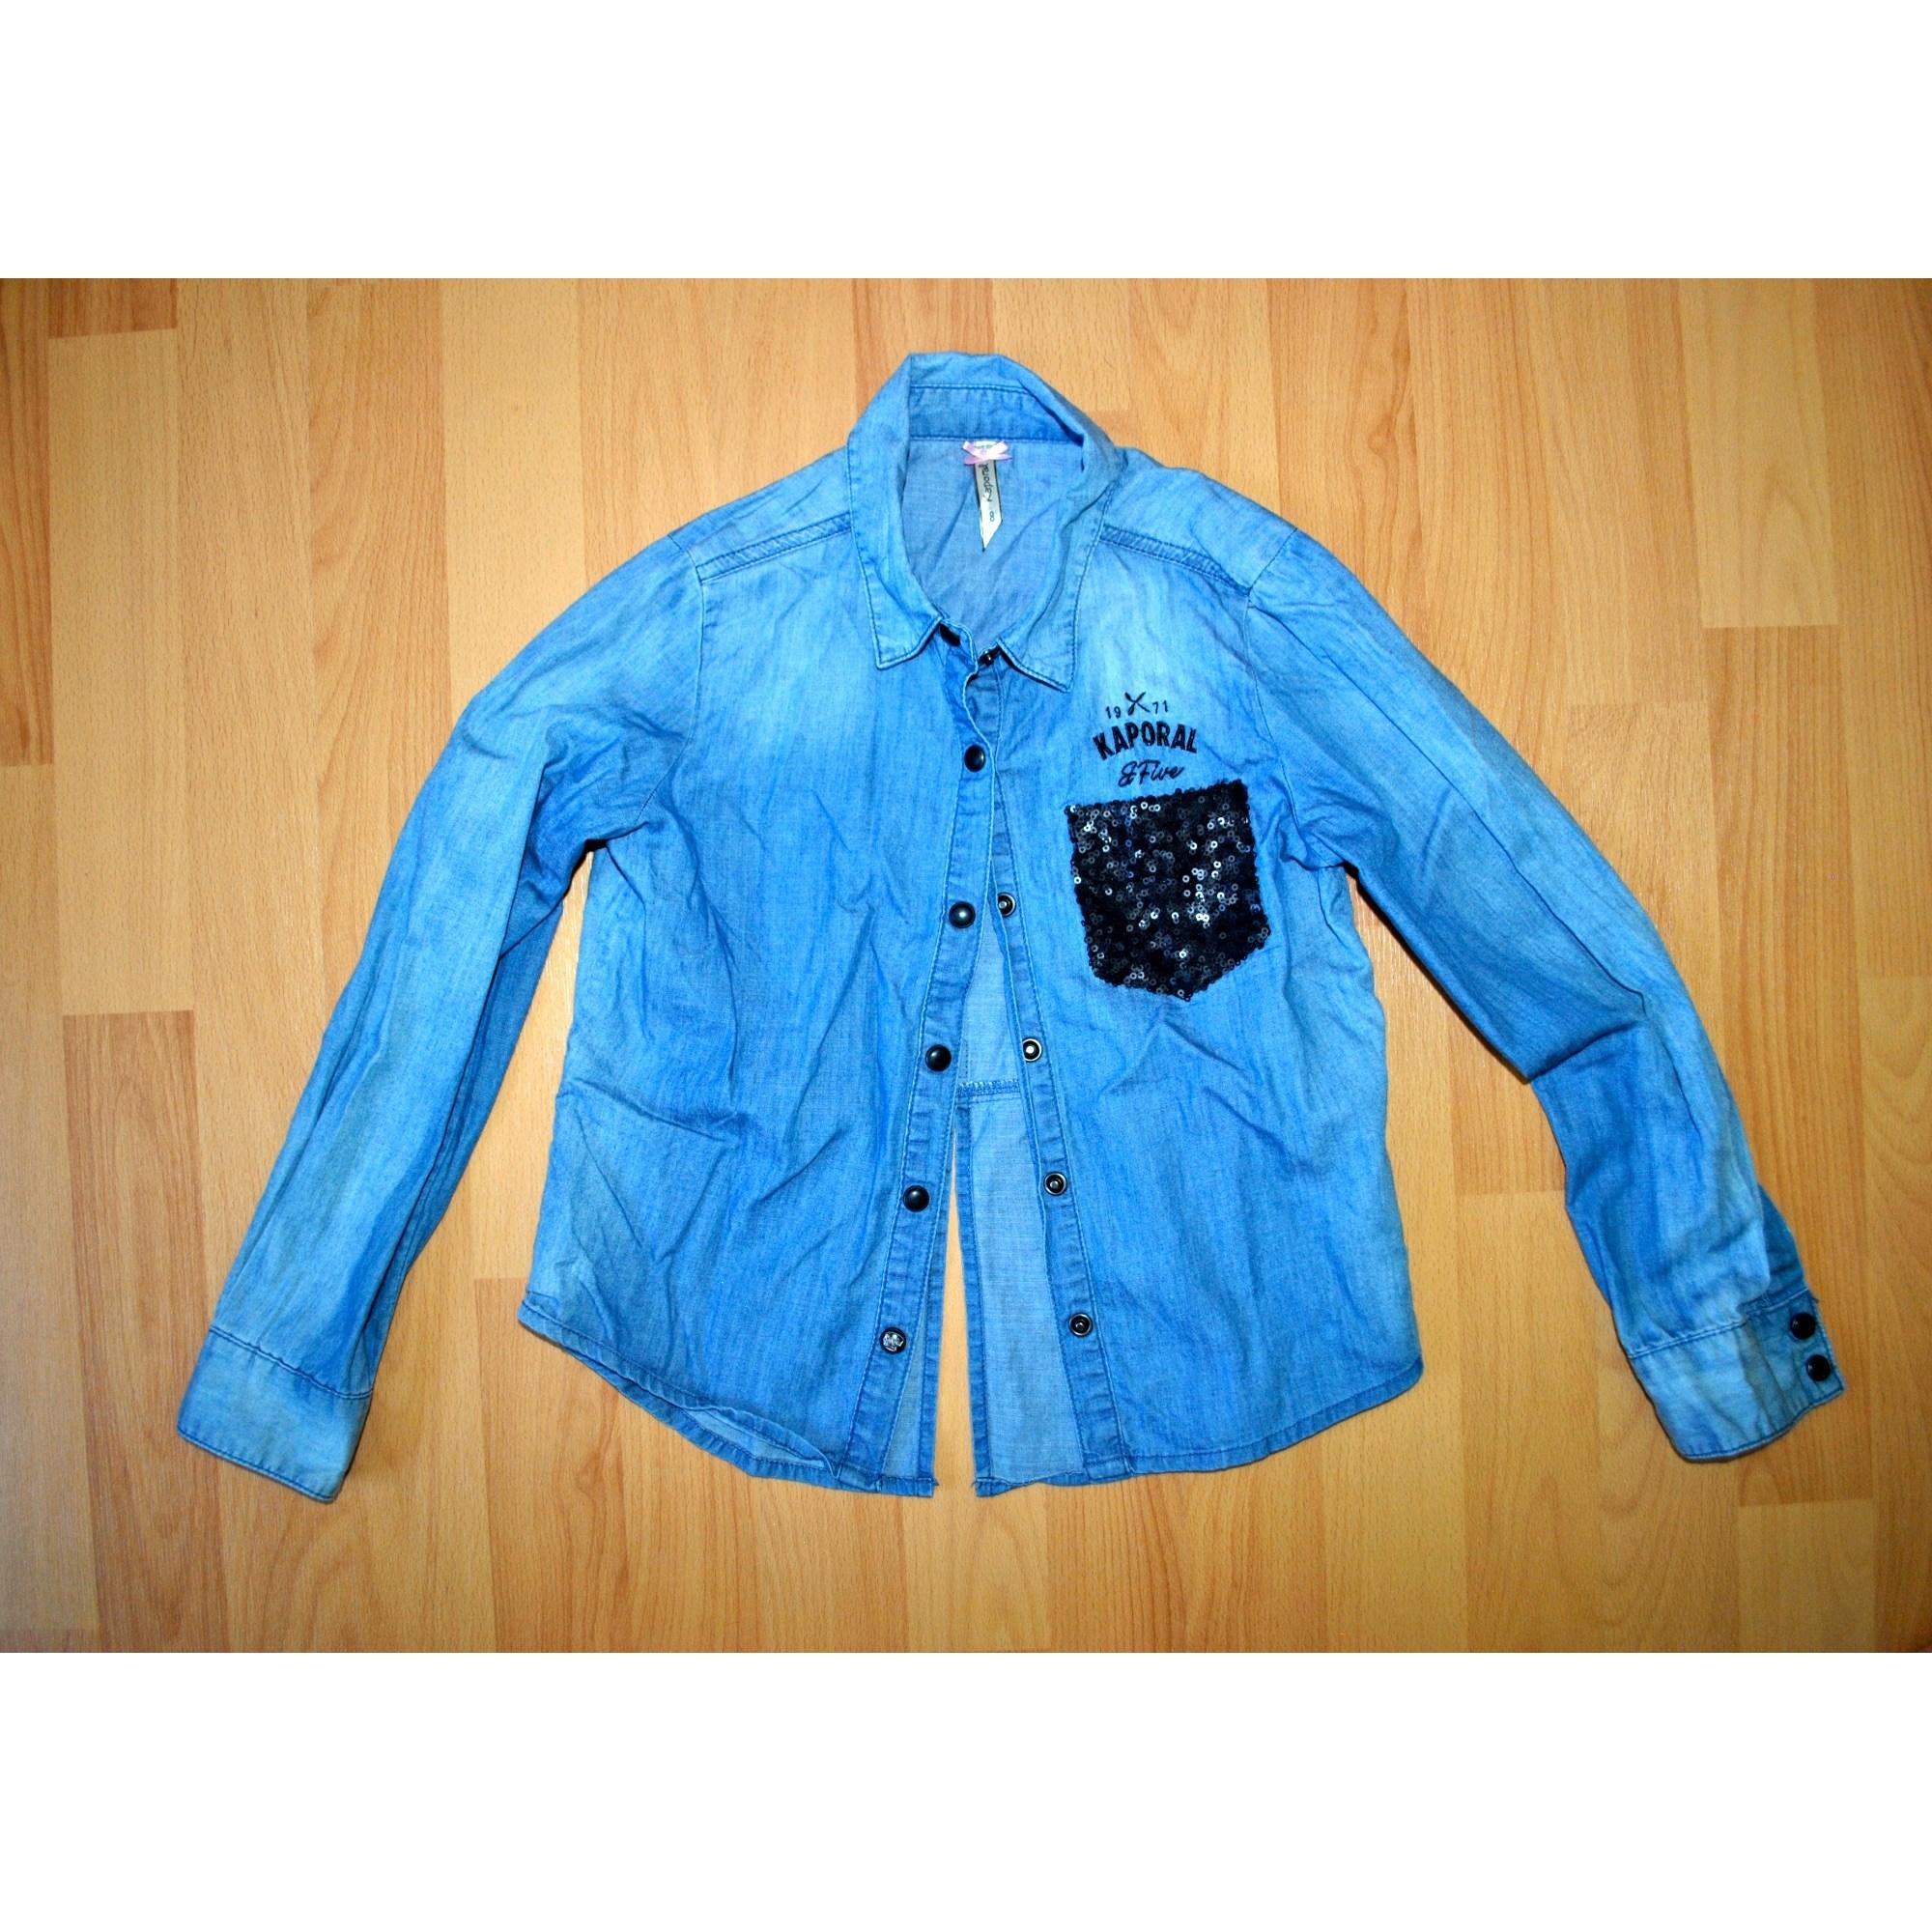 32cc6c7baa9fb Chemise KAPORAL Bleu, bleu marine, bleu turquoise